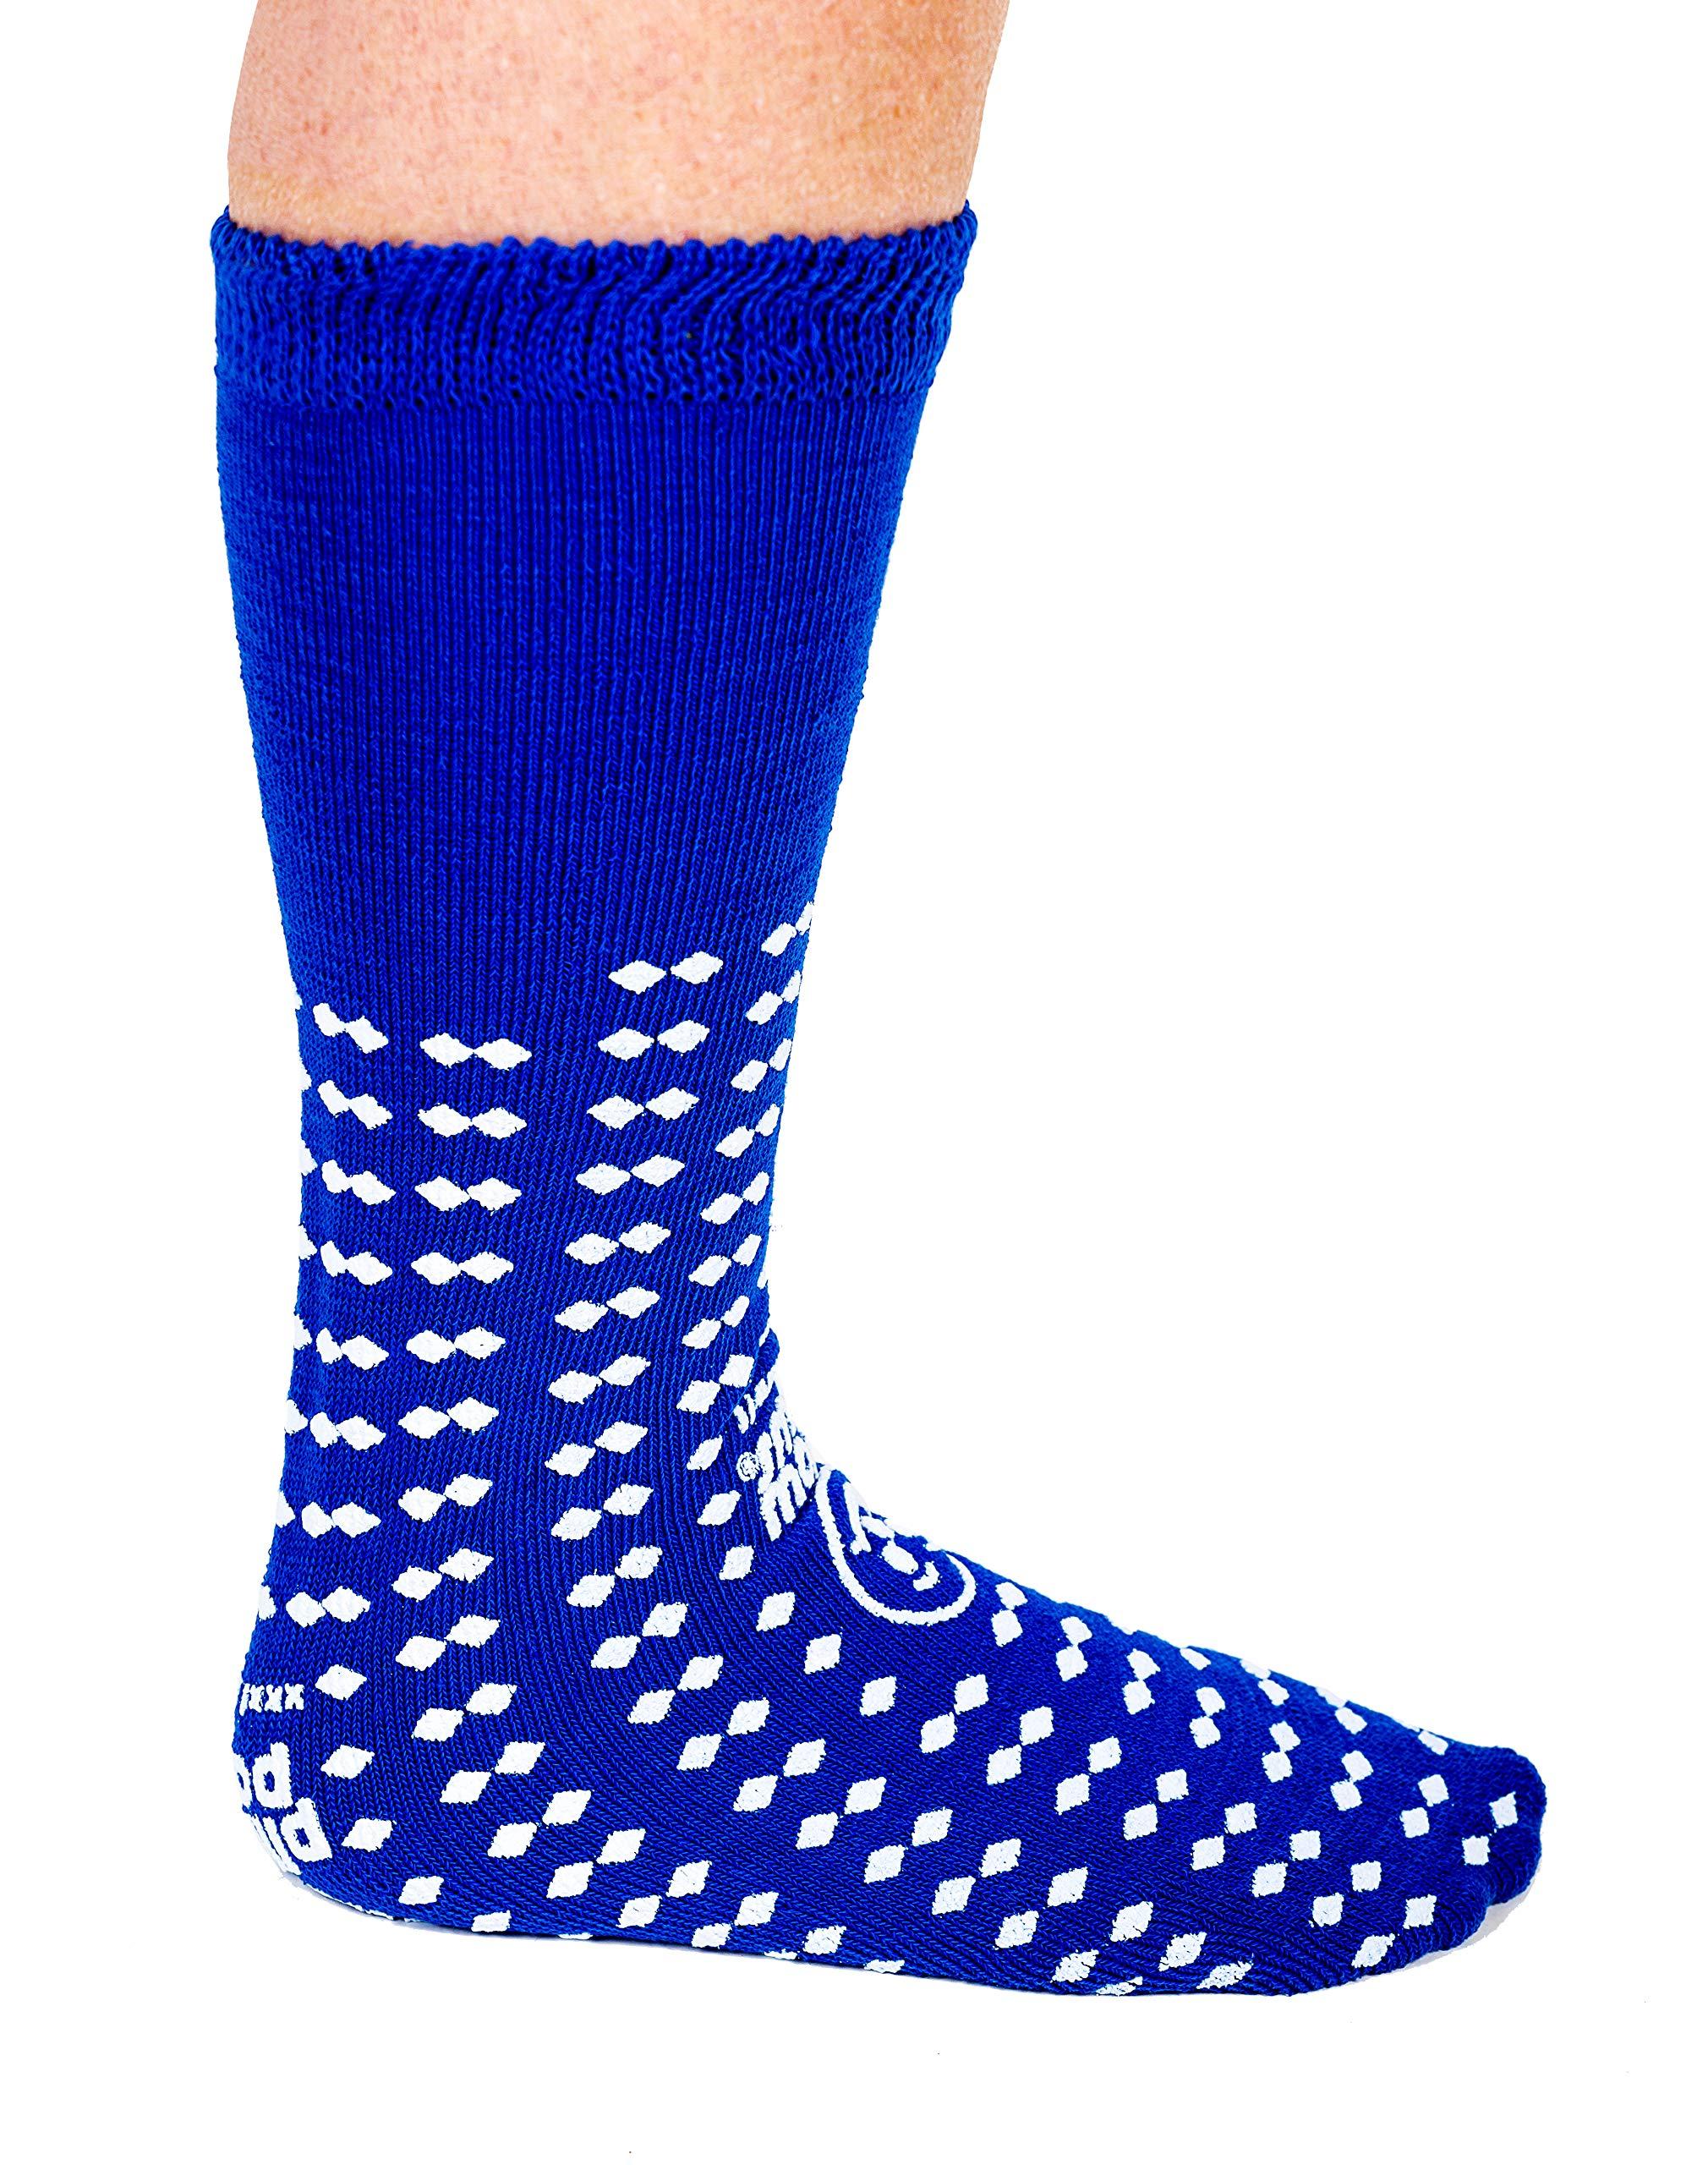 Wraparound Treaded Slip Stop Socks 360-Degree Tread (Blue XXXL Extra Wide Bariatric) (4 Pairs) by PrimeMed